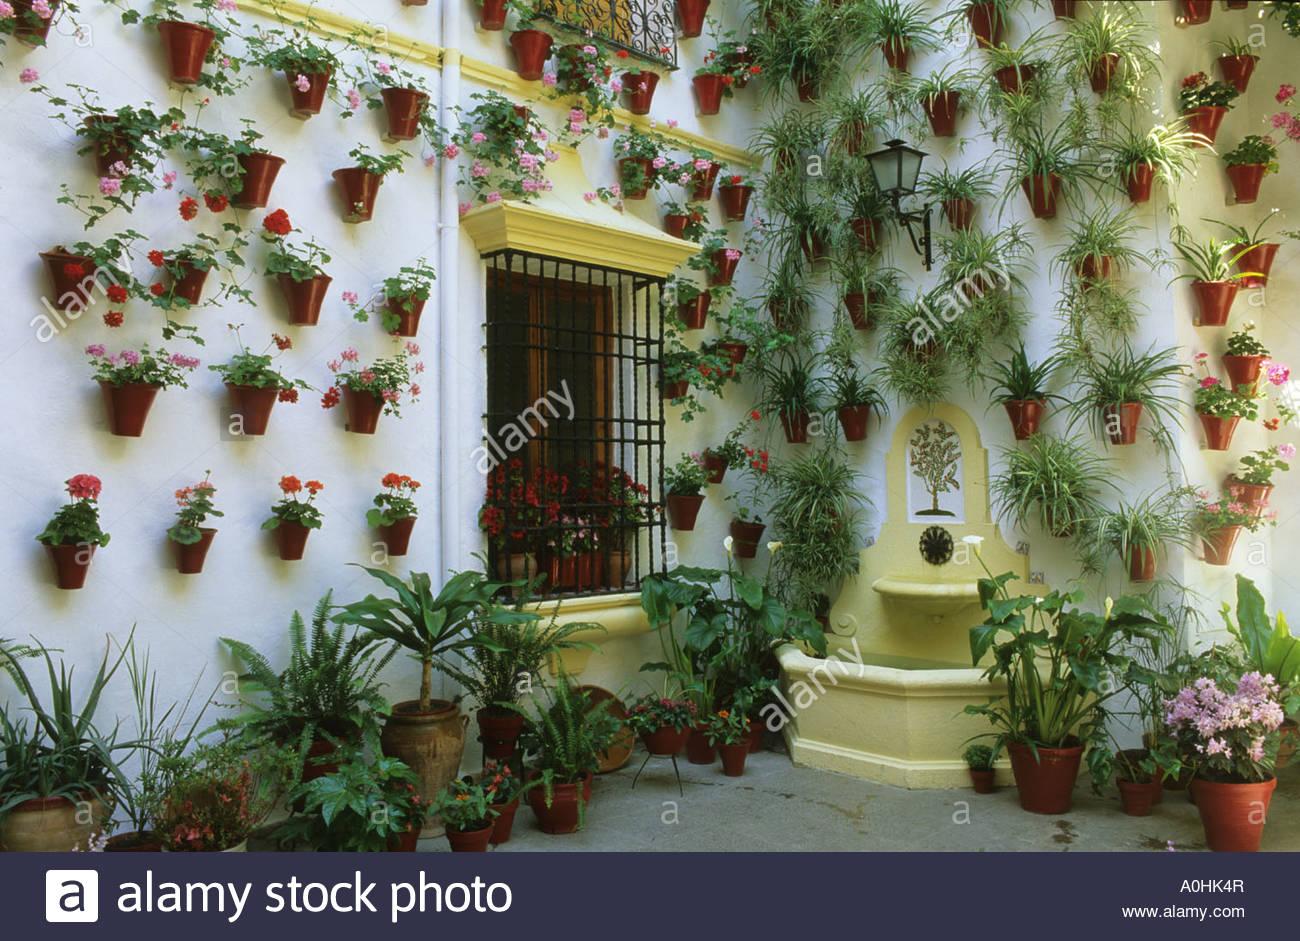 ... Cordoba Patio Festival Spain Pelargoniums In Wall Pots Courtyard Garden    Stock Photo